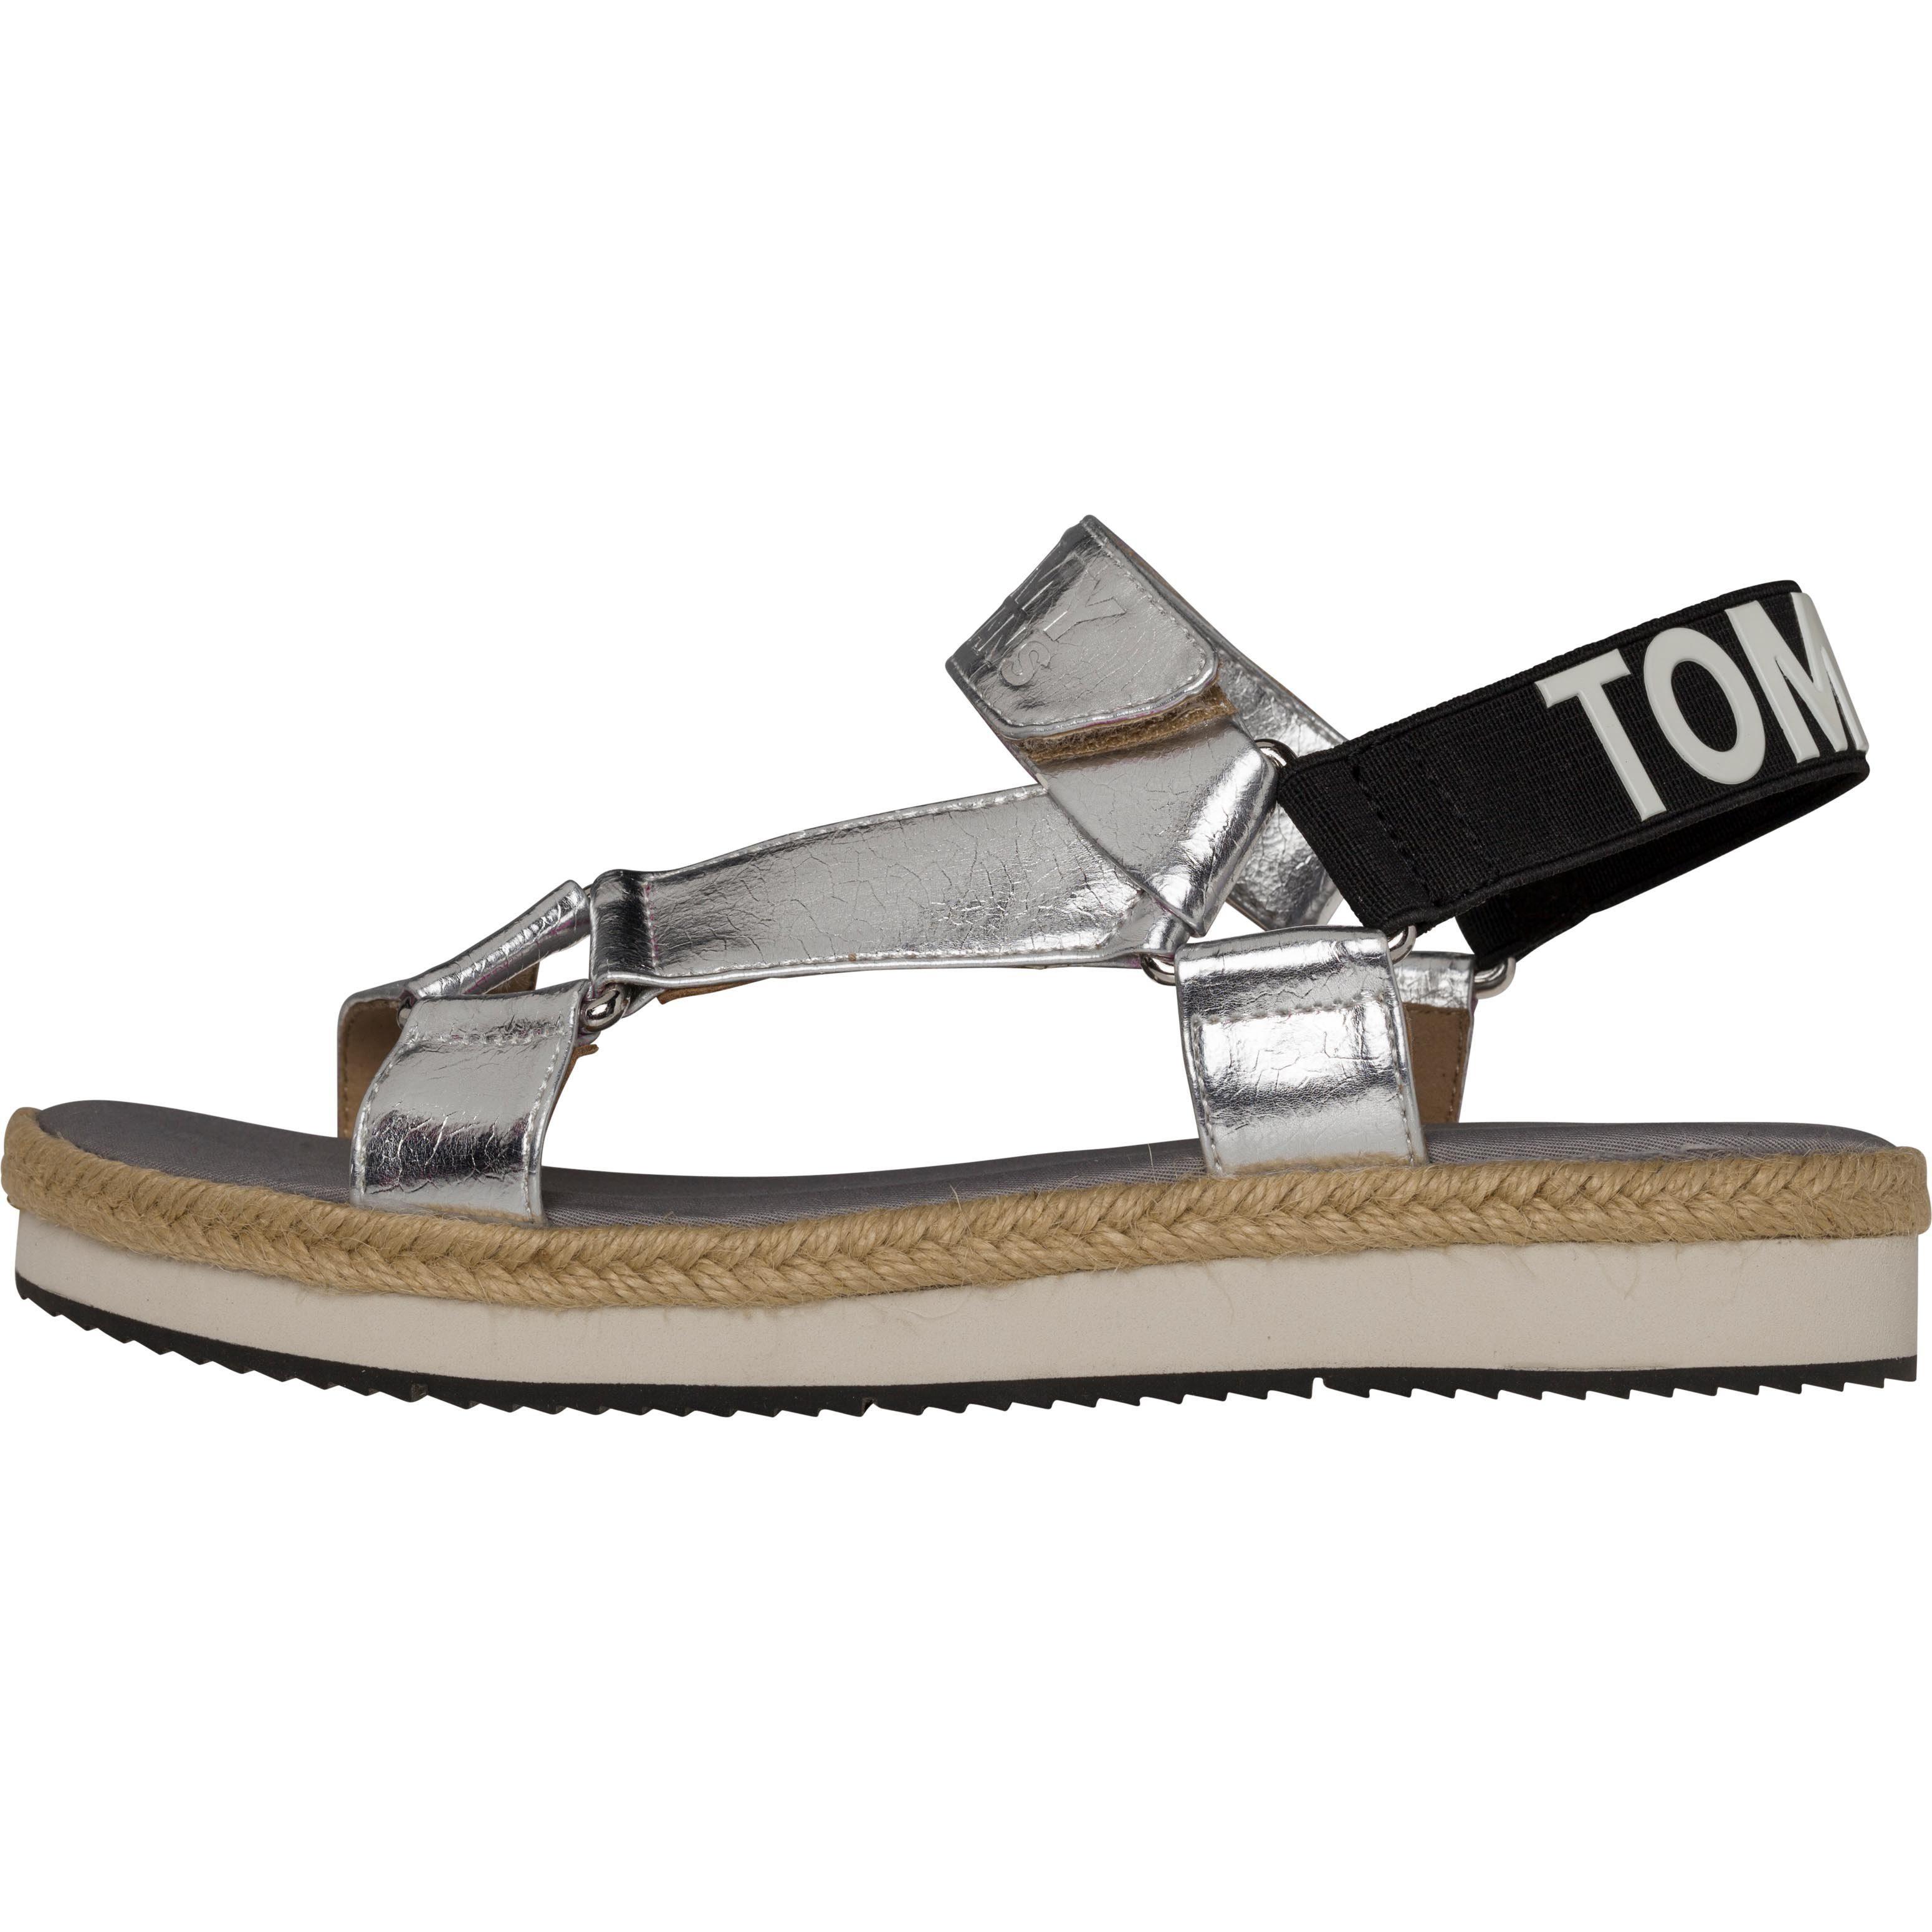 Tommy Jeans Sandalen FRESH MODERN METALLIC SANDAL online kaufen  SILVER